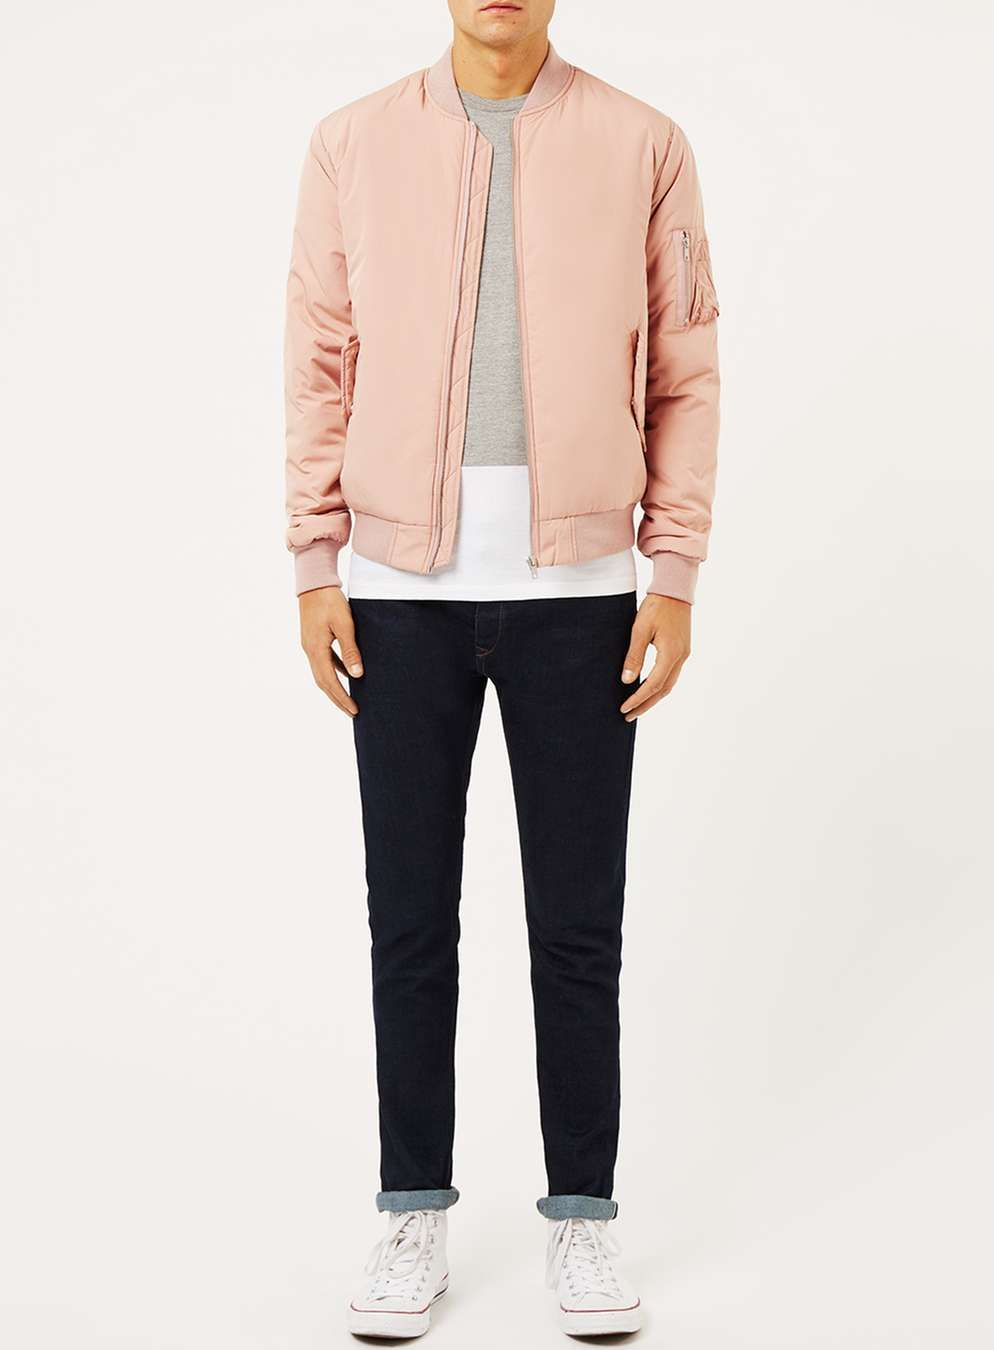 Light Pink Ma1 Bomber Jacket Men S Coats Jackets Clothing Topman Stylish Mens Fashion Clothes Bomber Jacket Mens [ 1350 x 994 Pixel ]